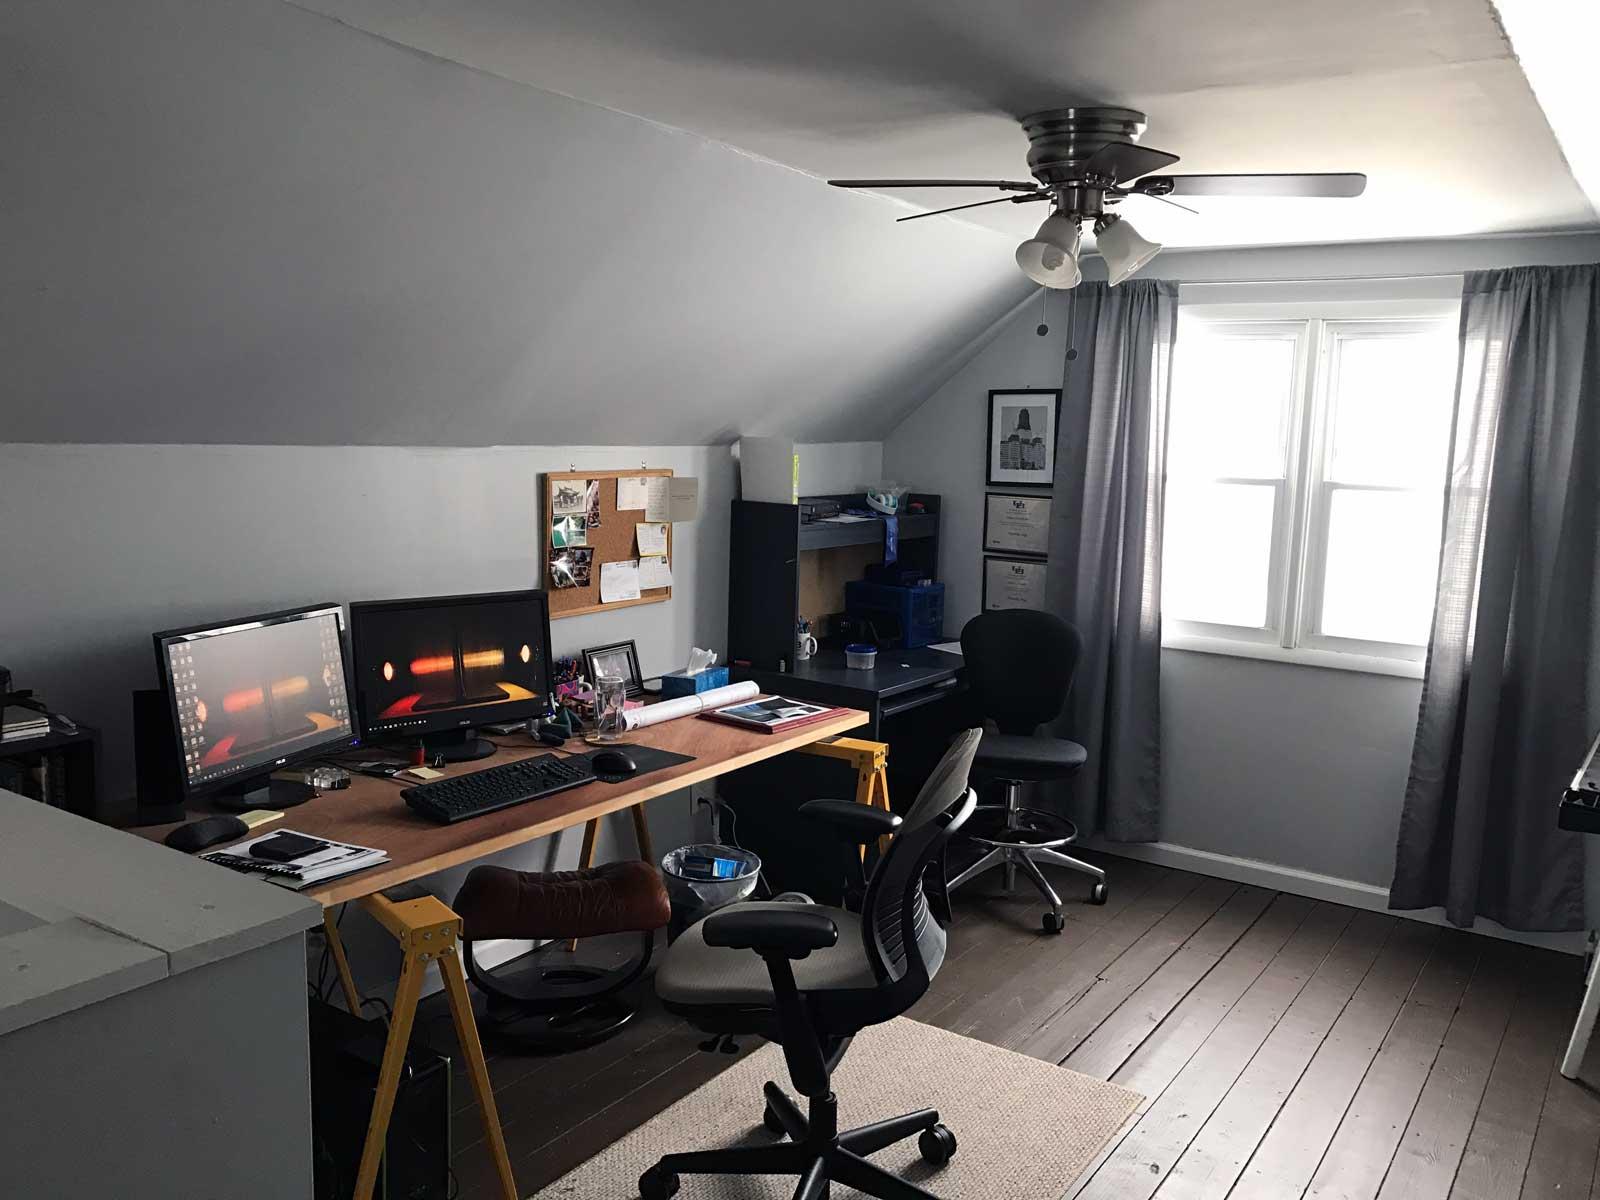 Studio space in the attic